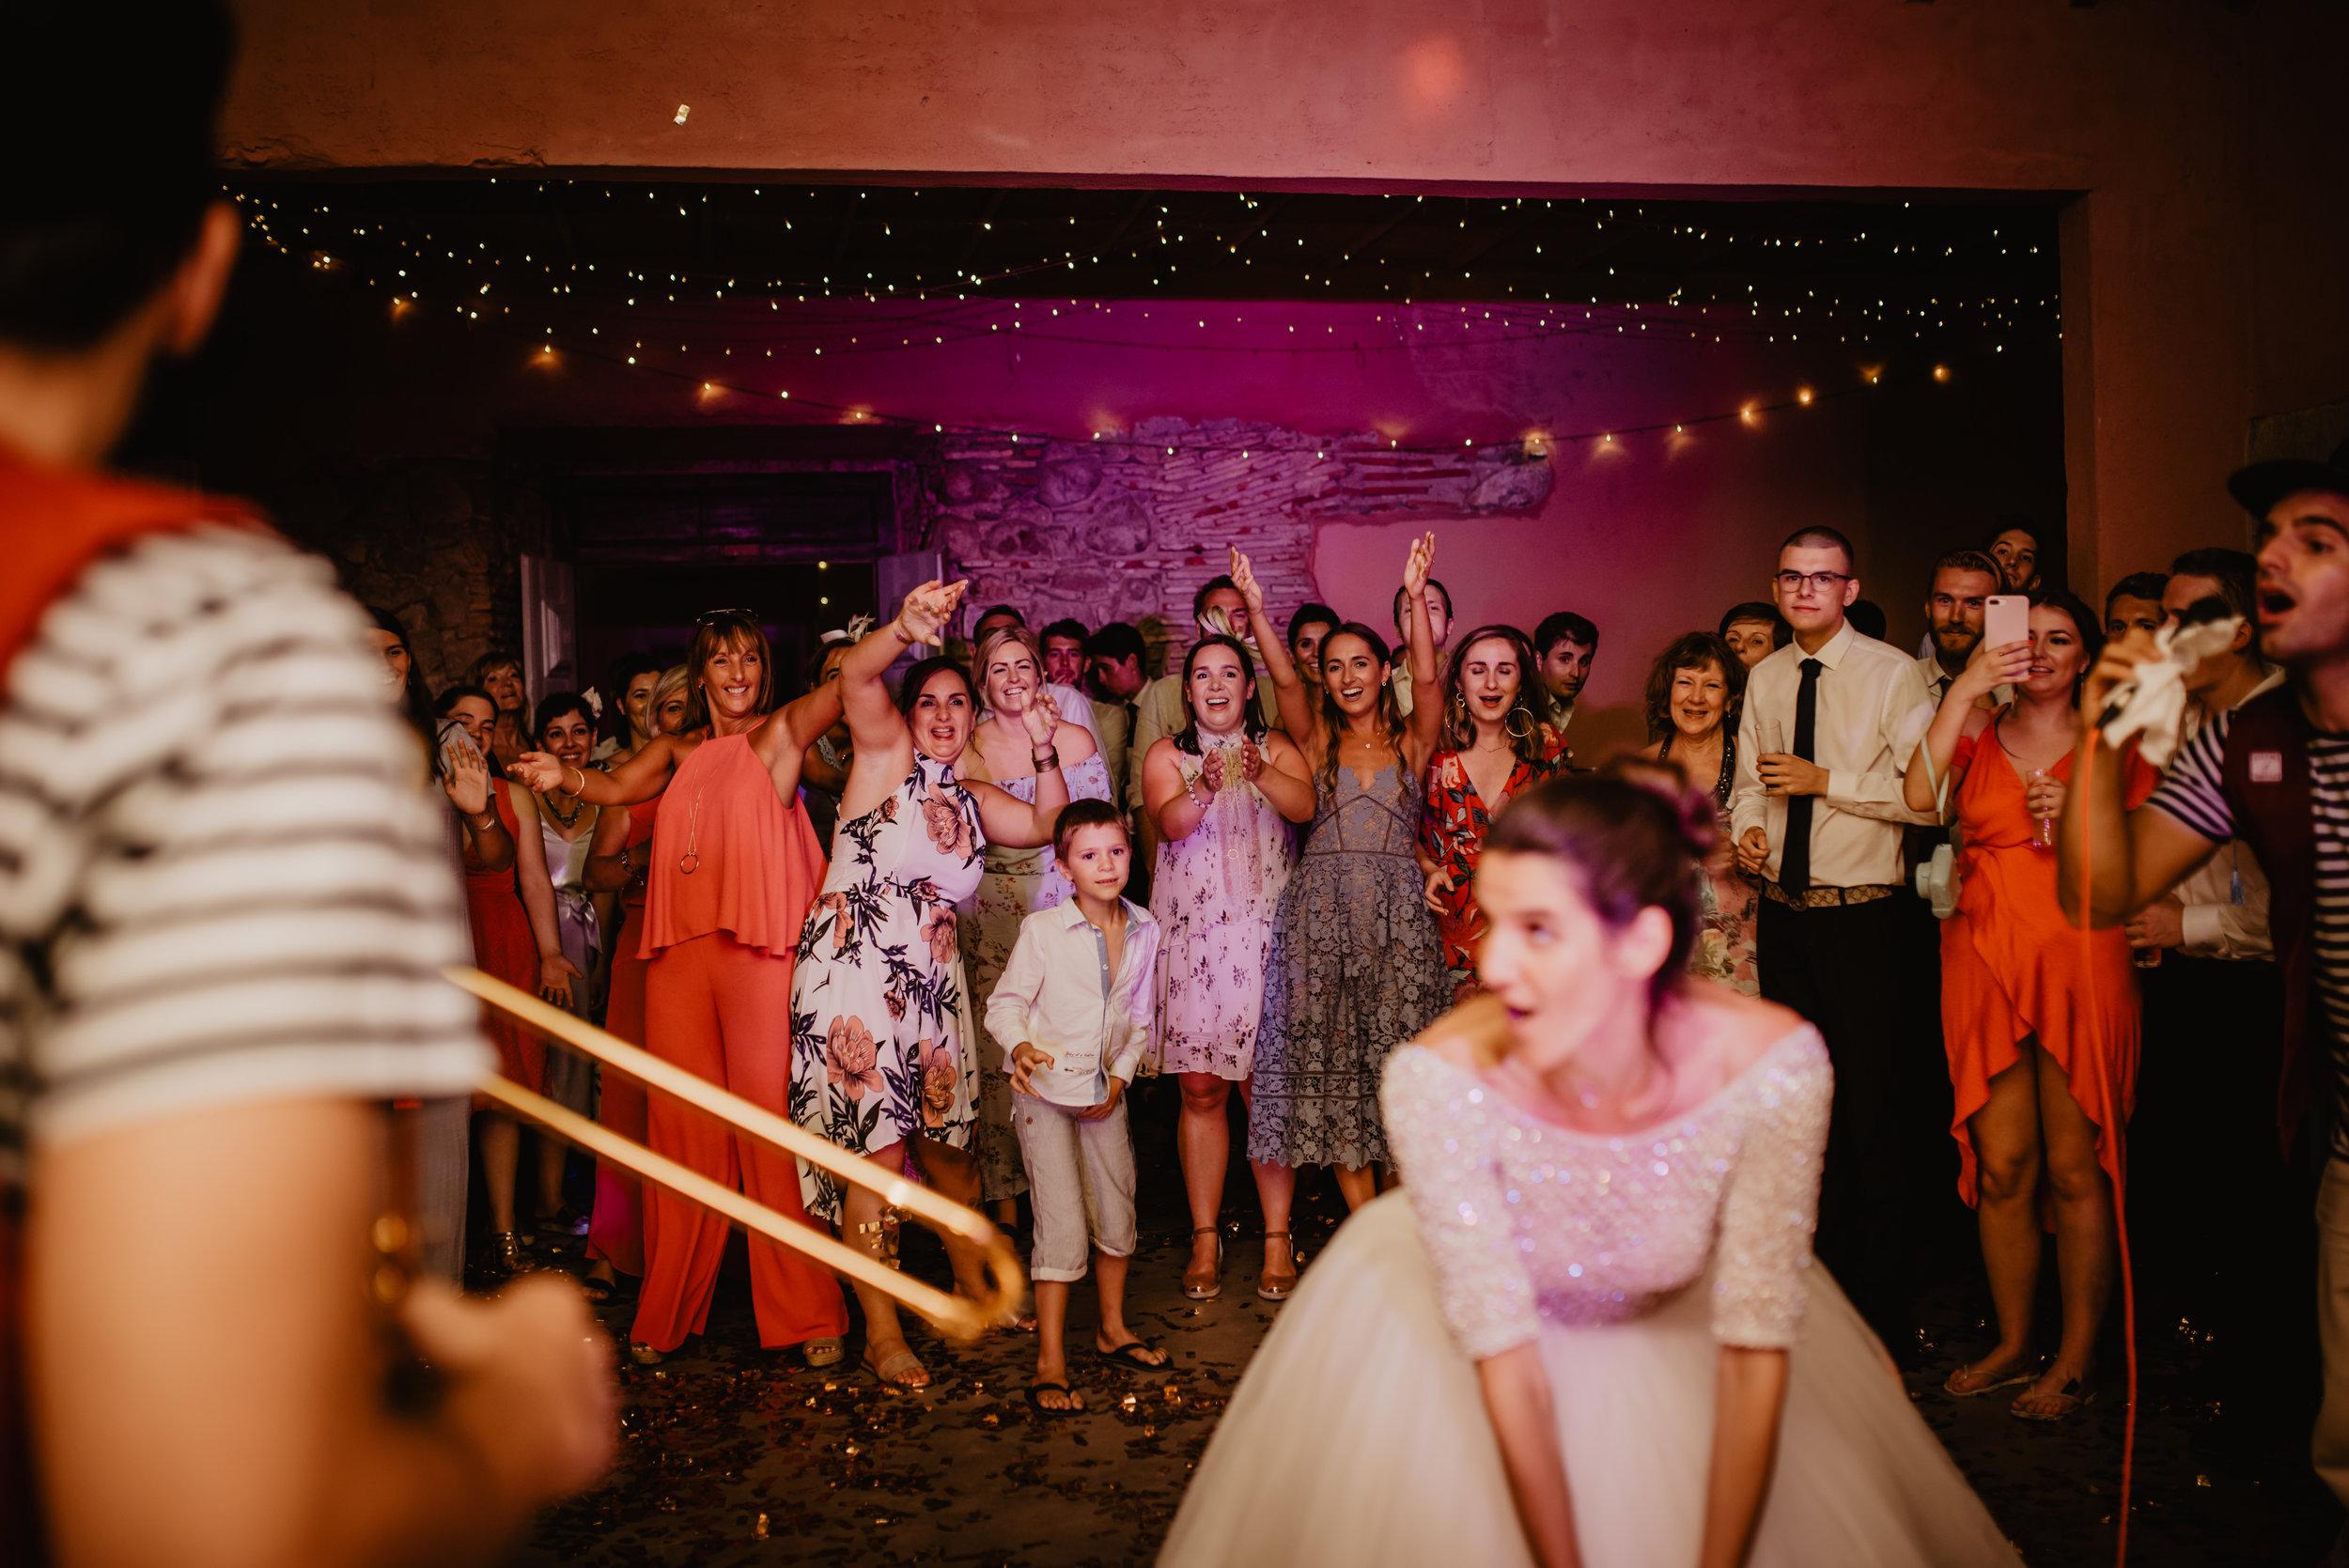 Lapela-photography-wedding-sintra-portugal-137.jpg